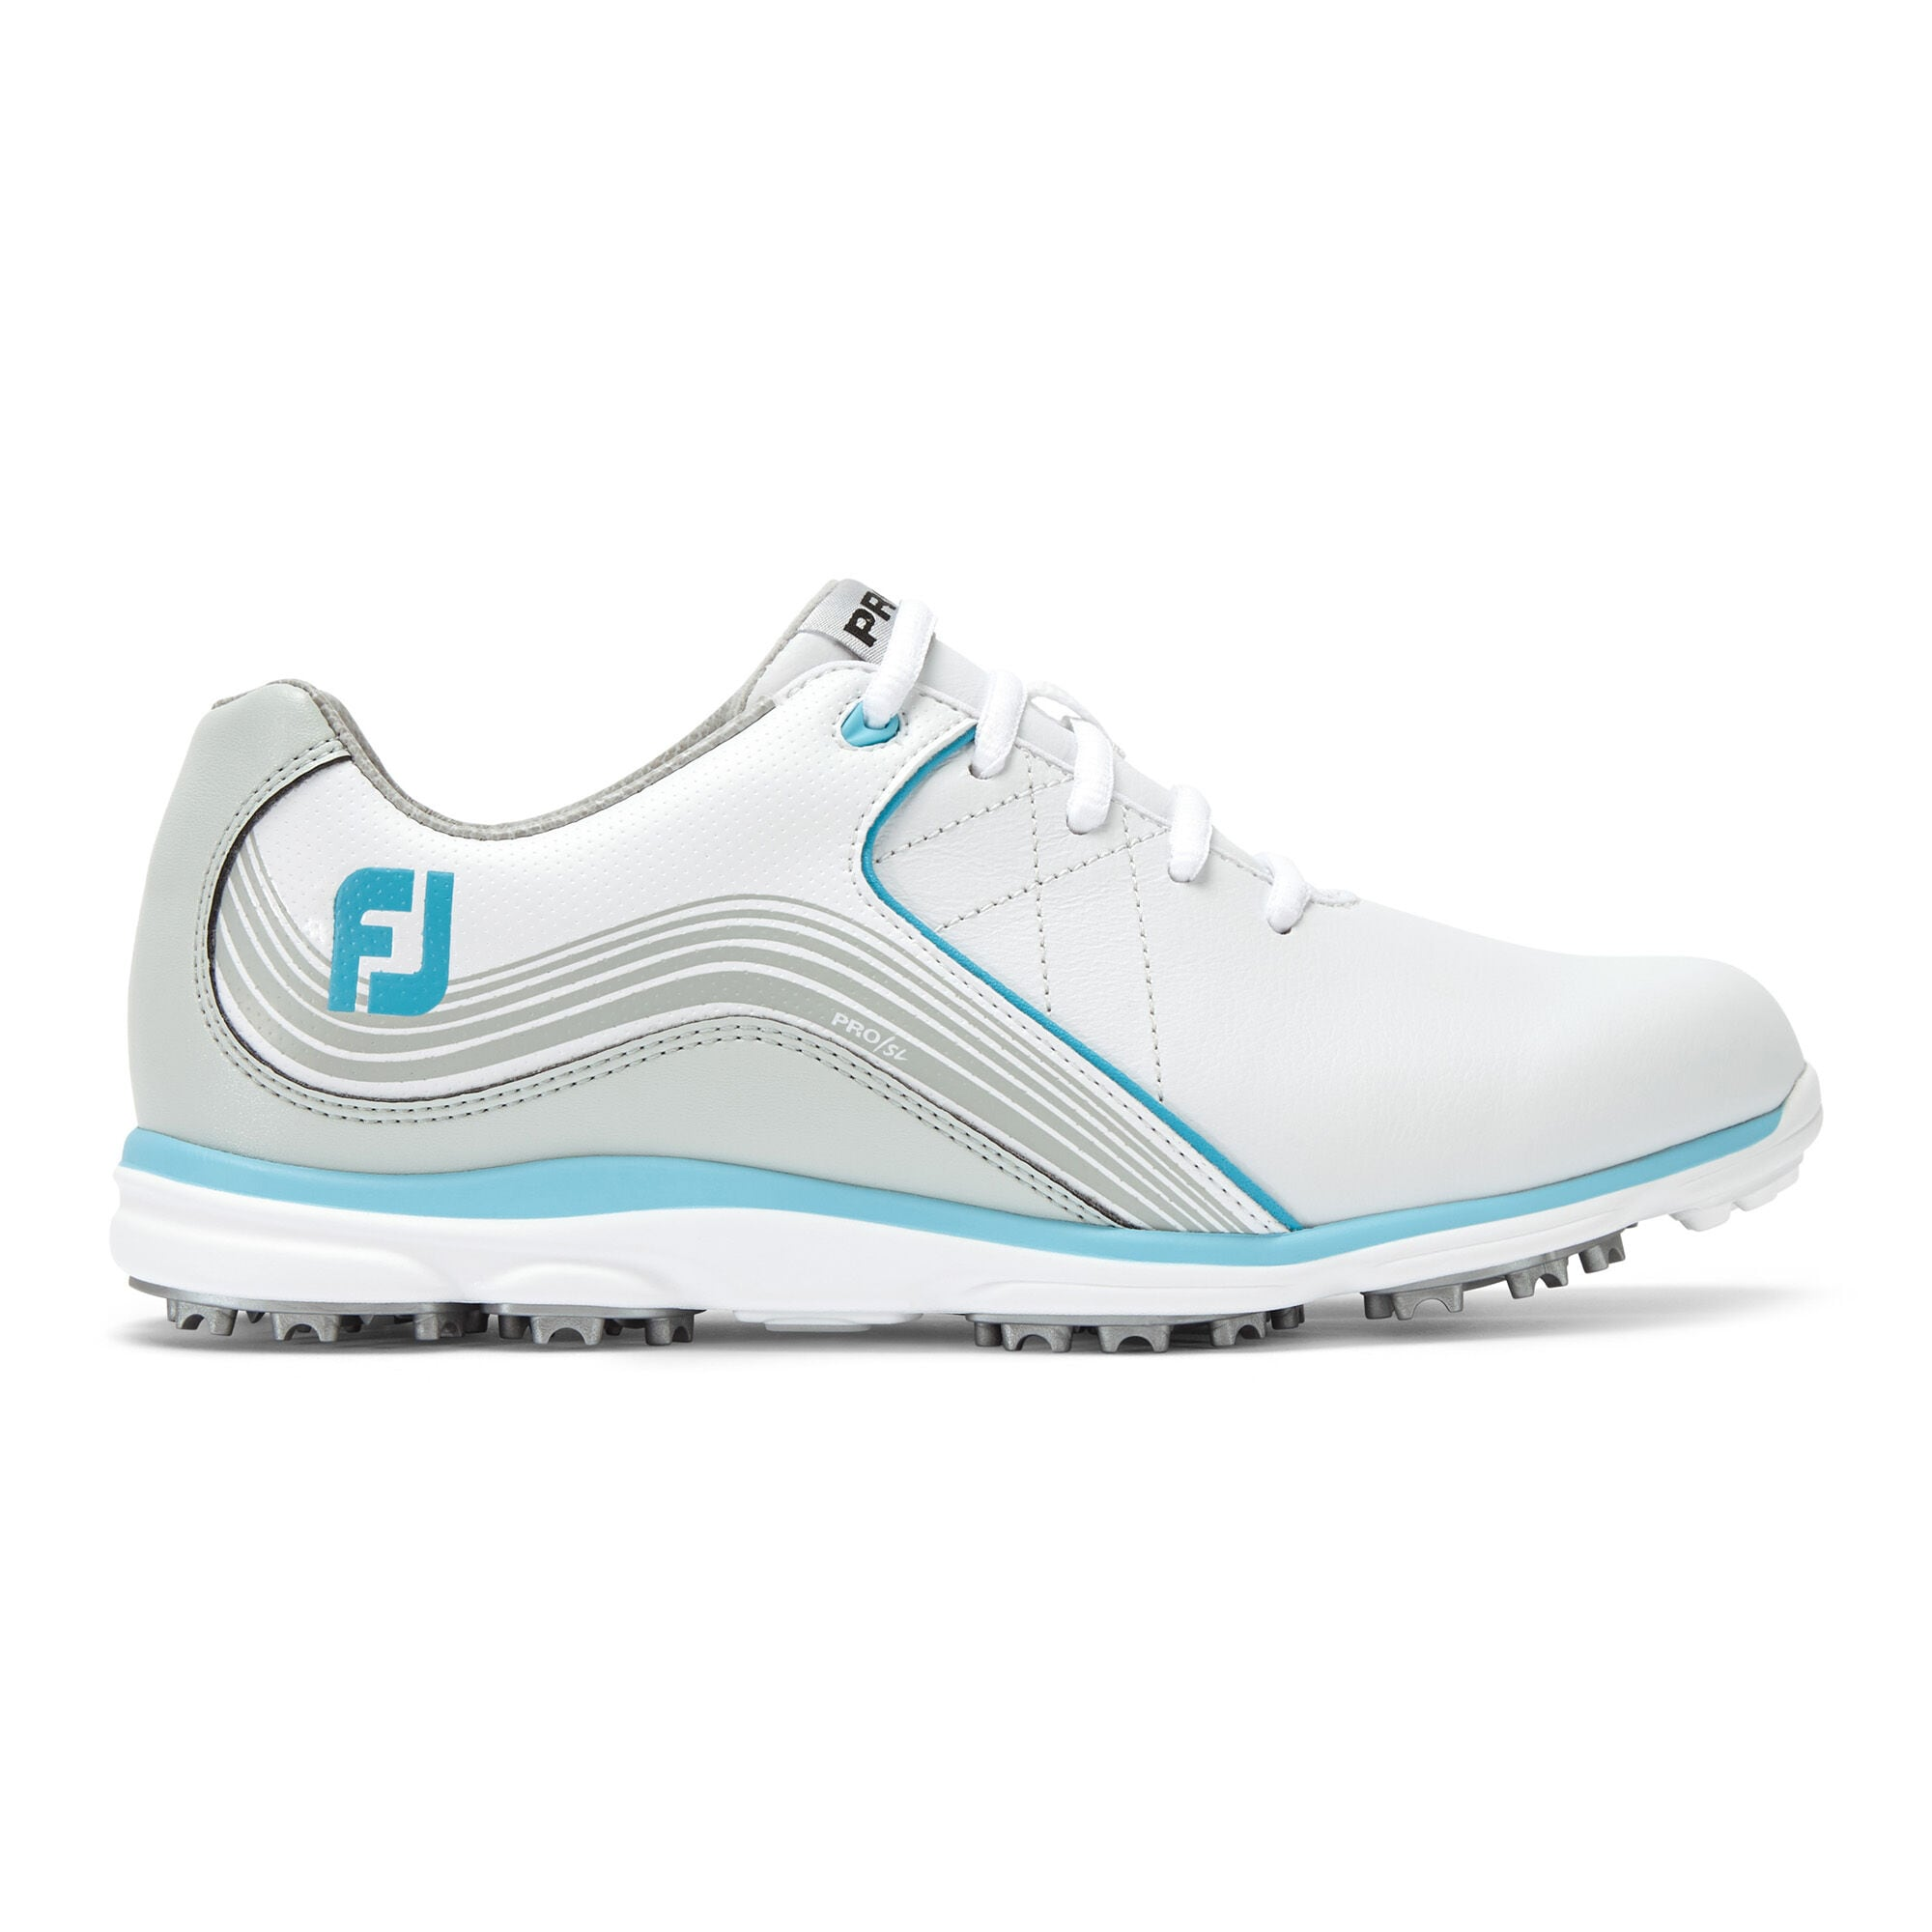 Pro/SL Women's Golf Shoes | FootJoy